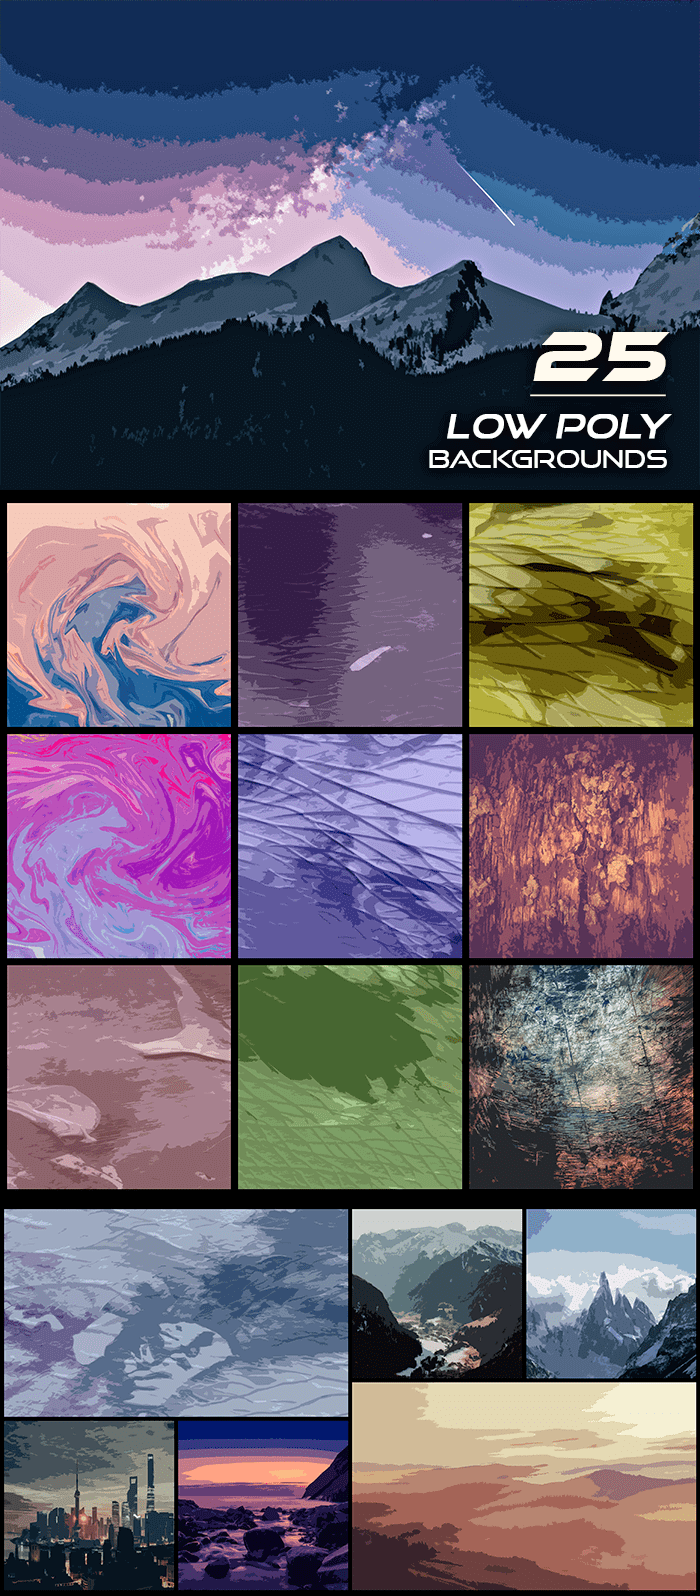 2000+ High Resolution Digital Backgrounds Bundle - $29 - 25 Low Poly Backgrounds